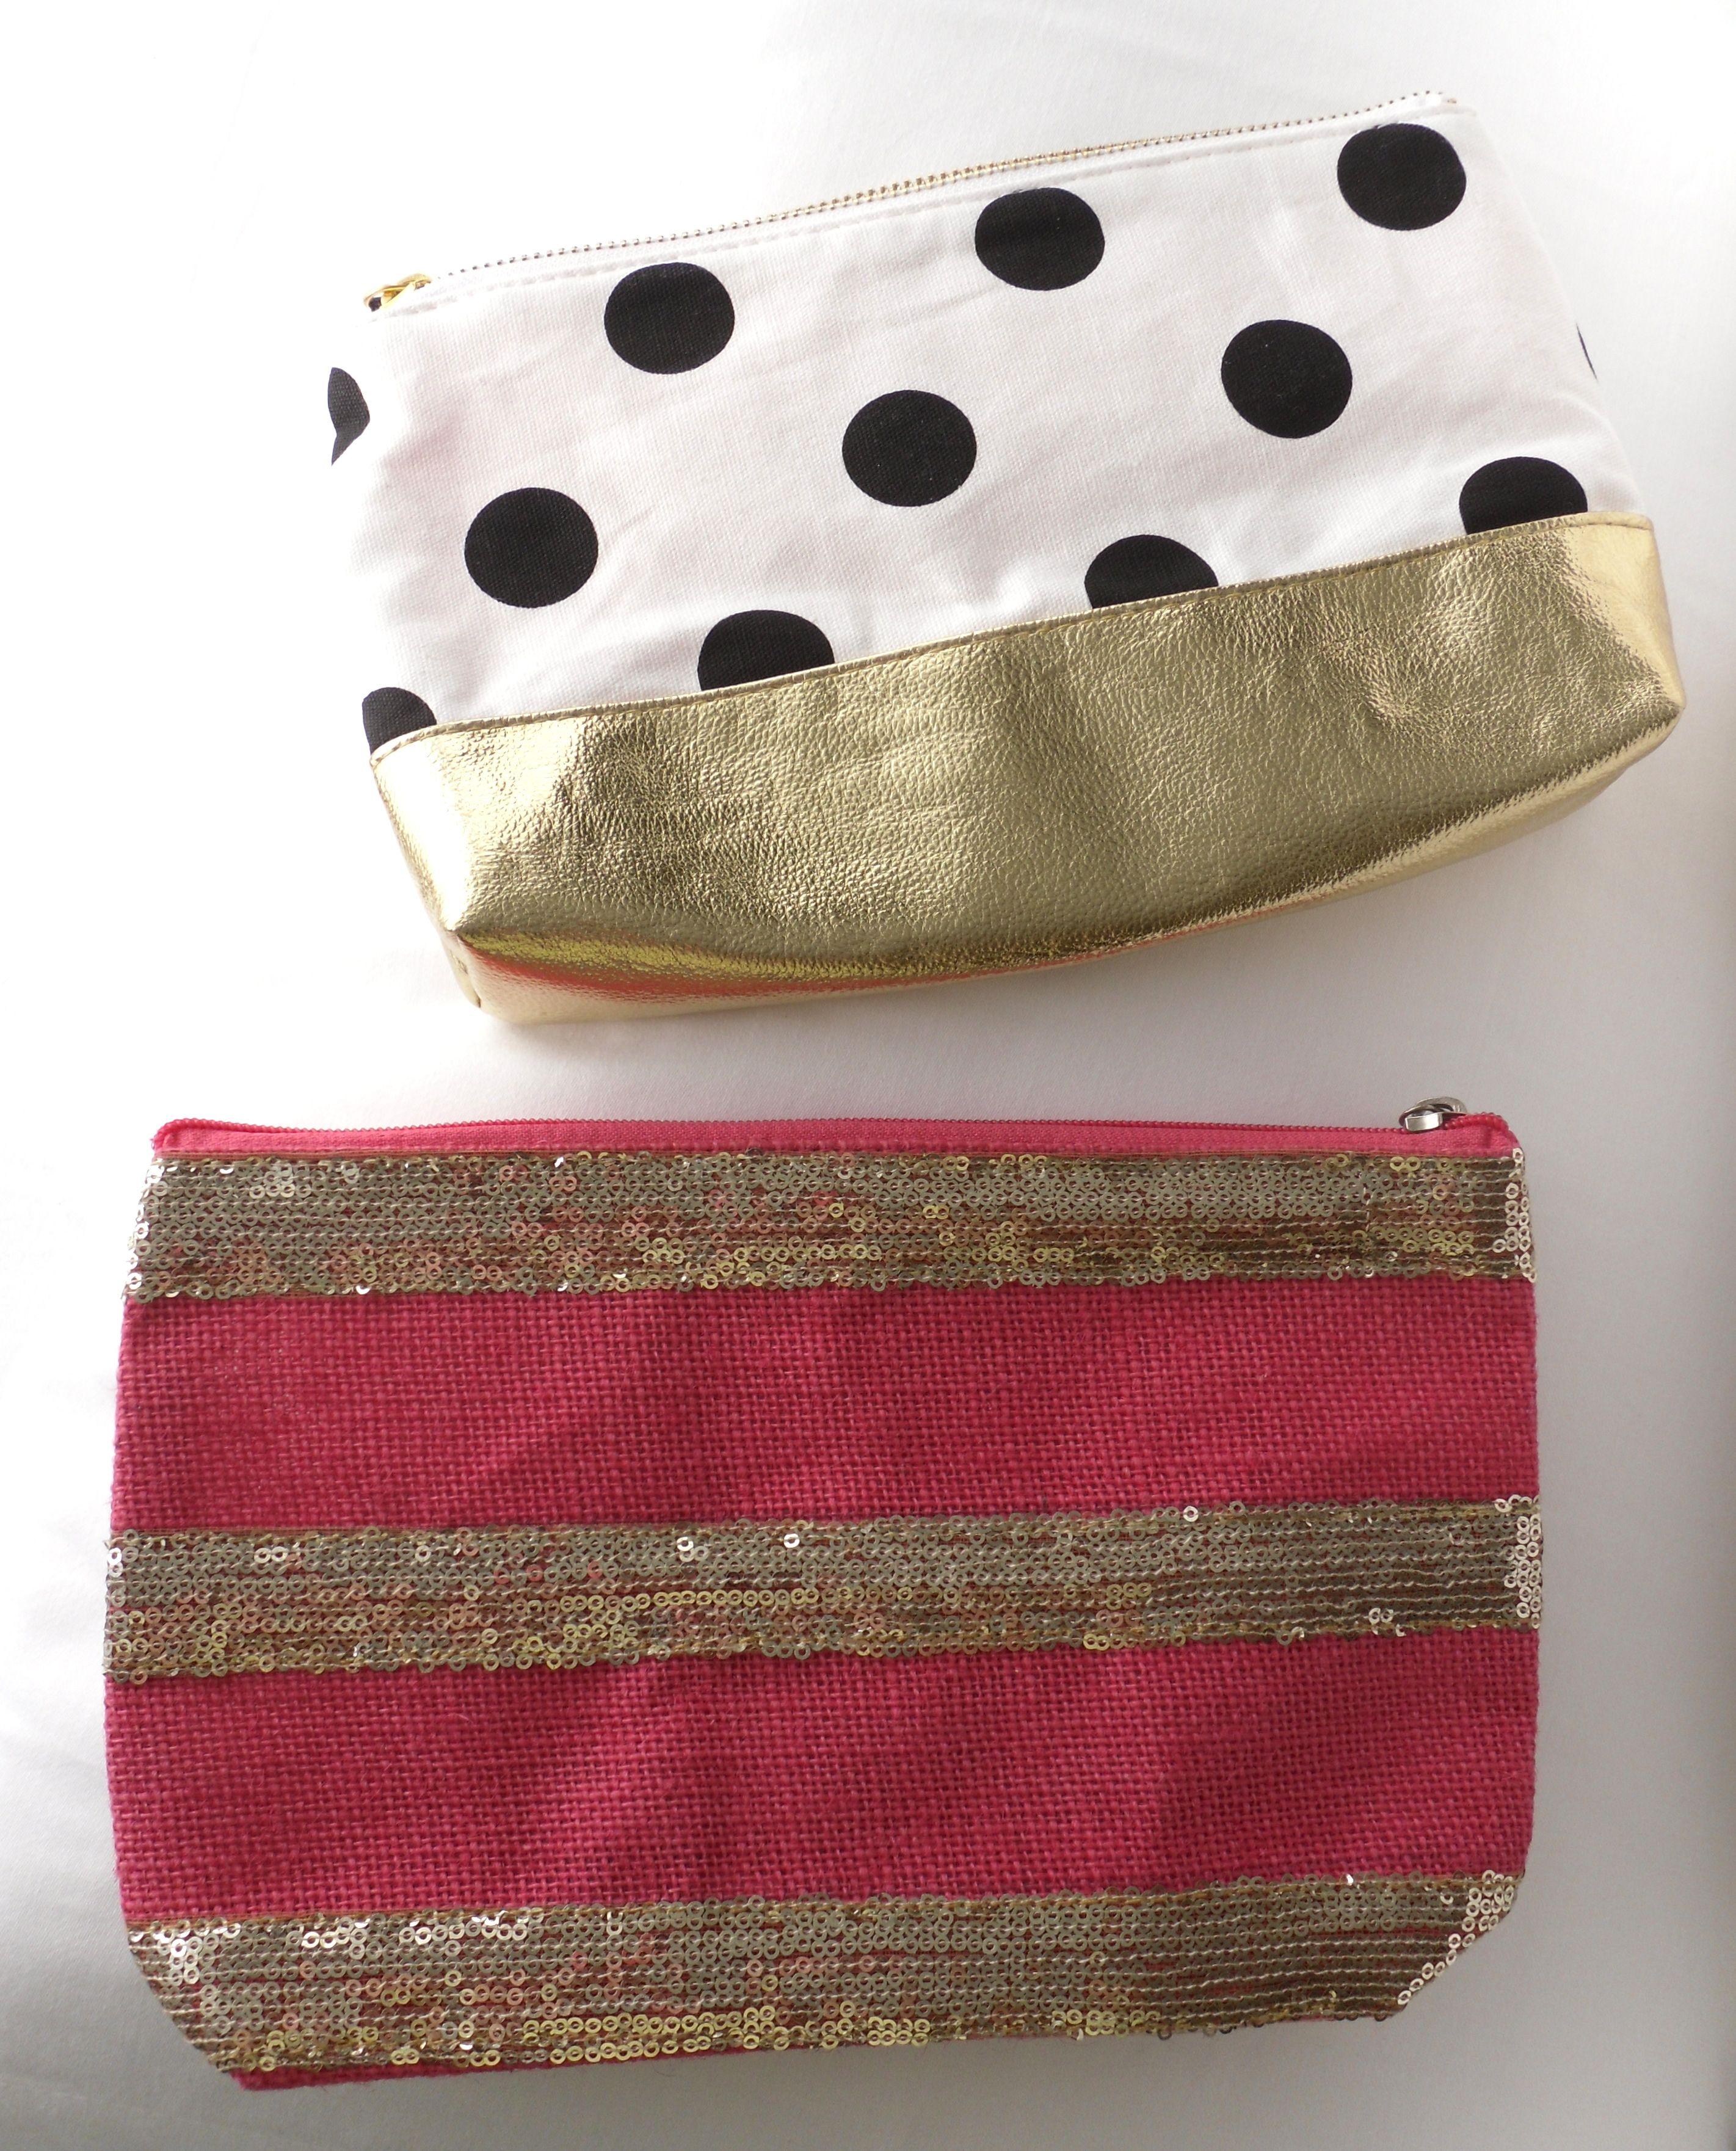 Forever21 black/white/gold polka dot cosmetic bag, pink